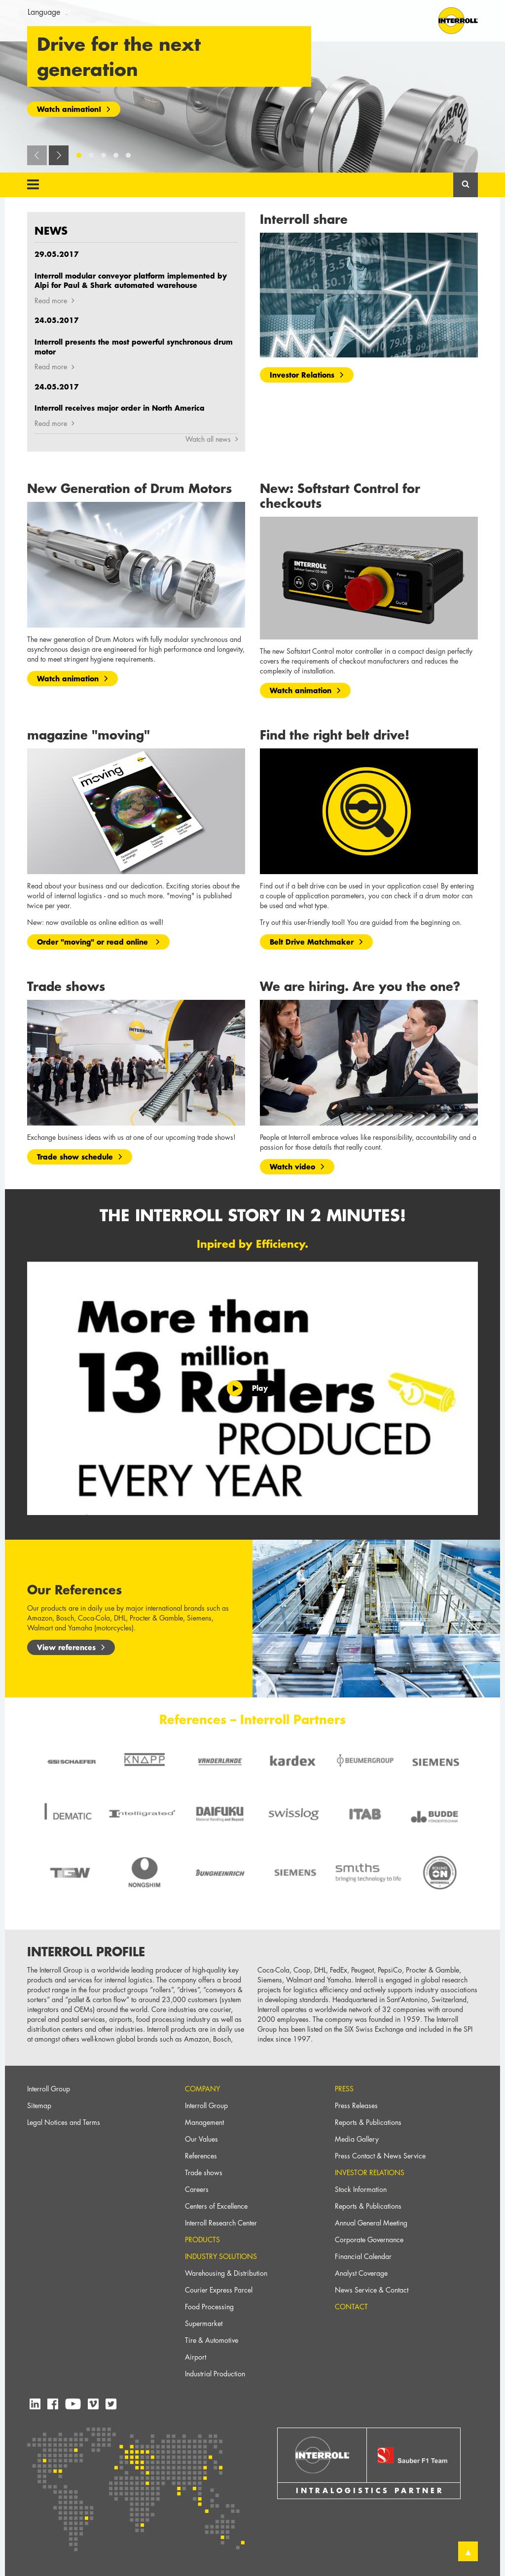 Interroll petitors Revenue and Employees Owler pany Profile